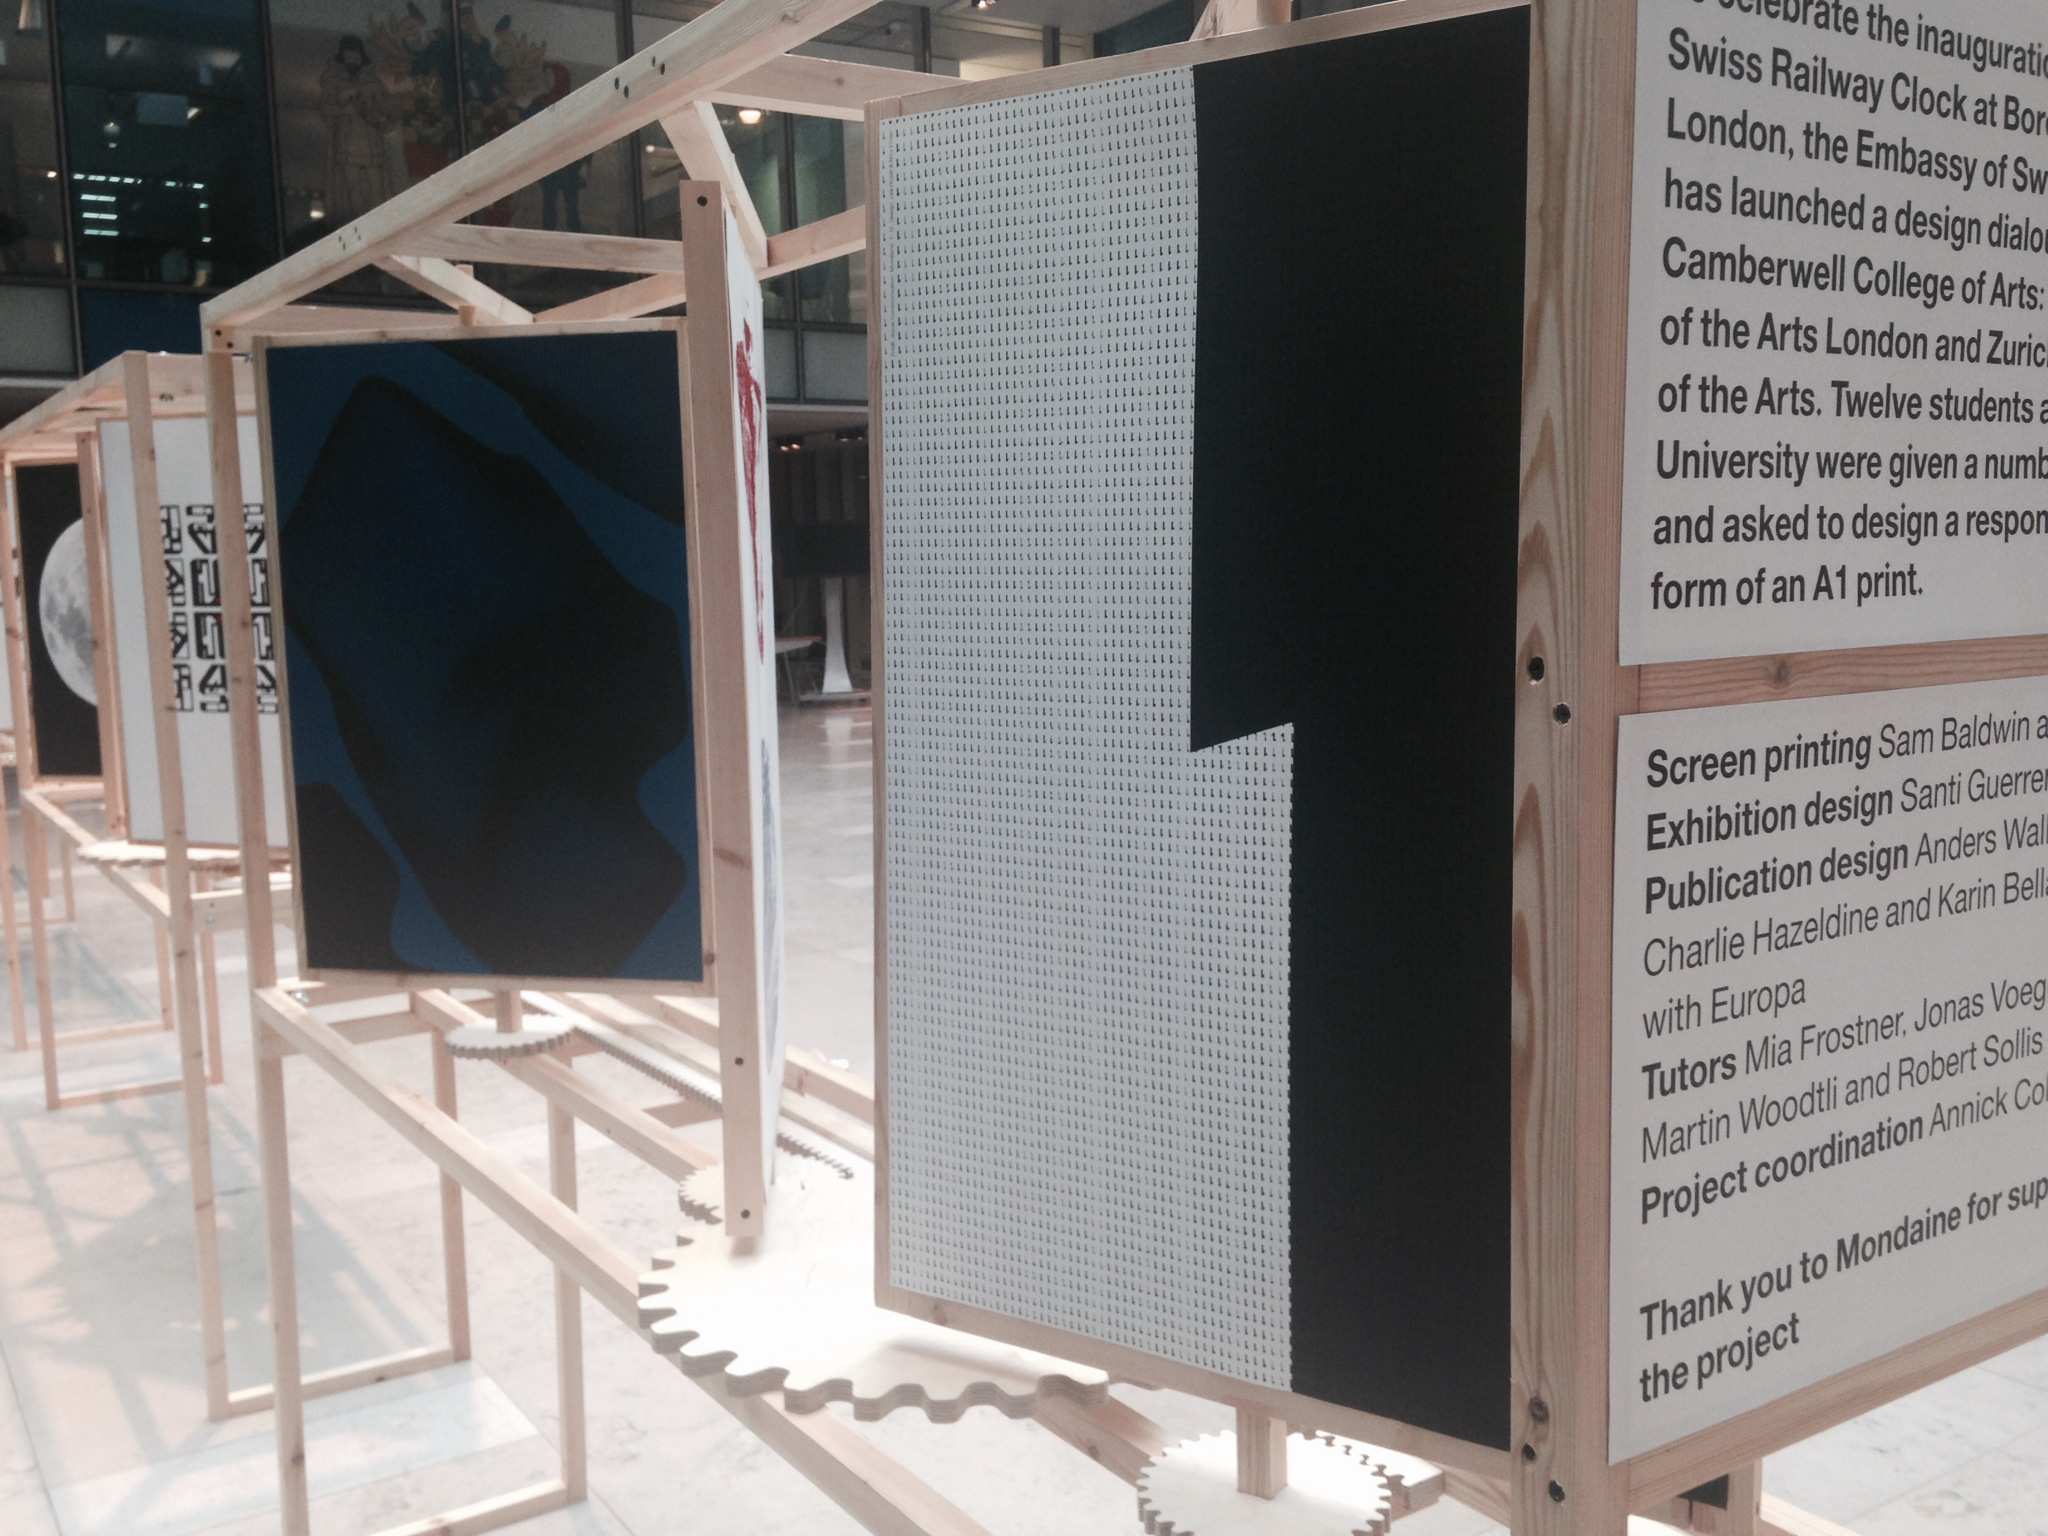 SPACE DESIGN - Exhibitions, urban areas, flexible spaces